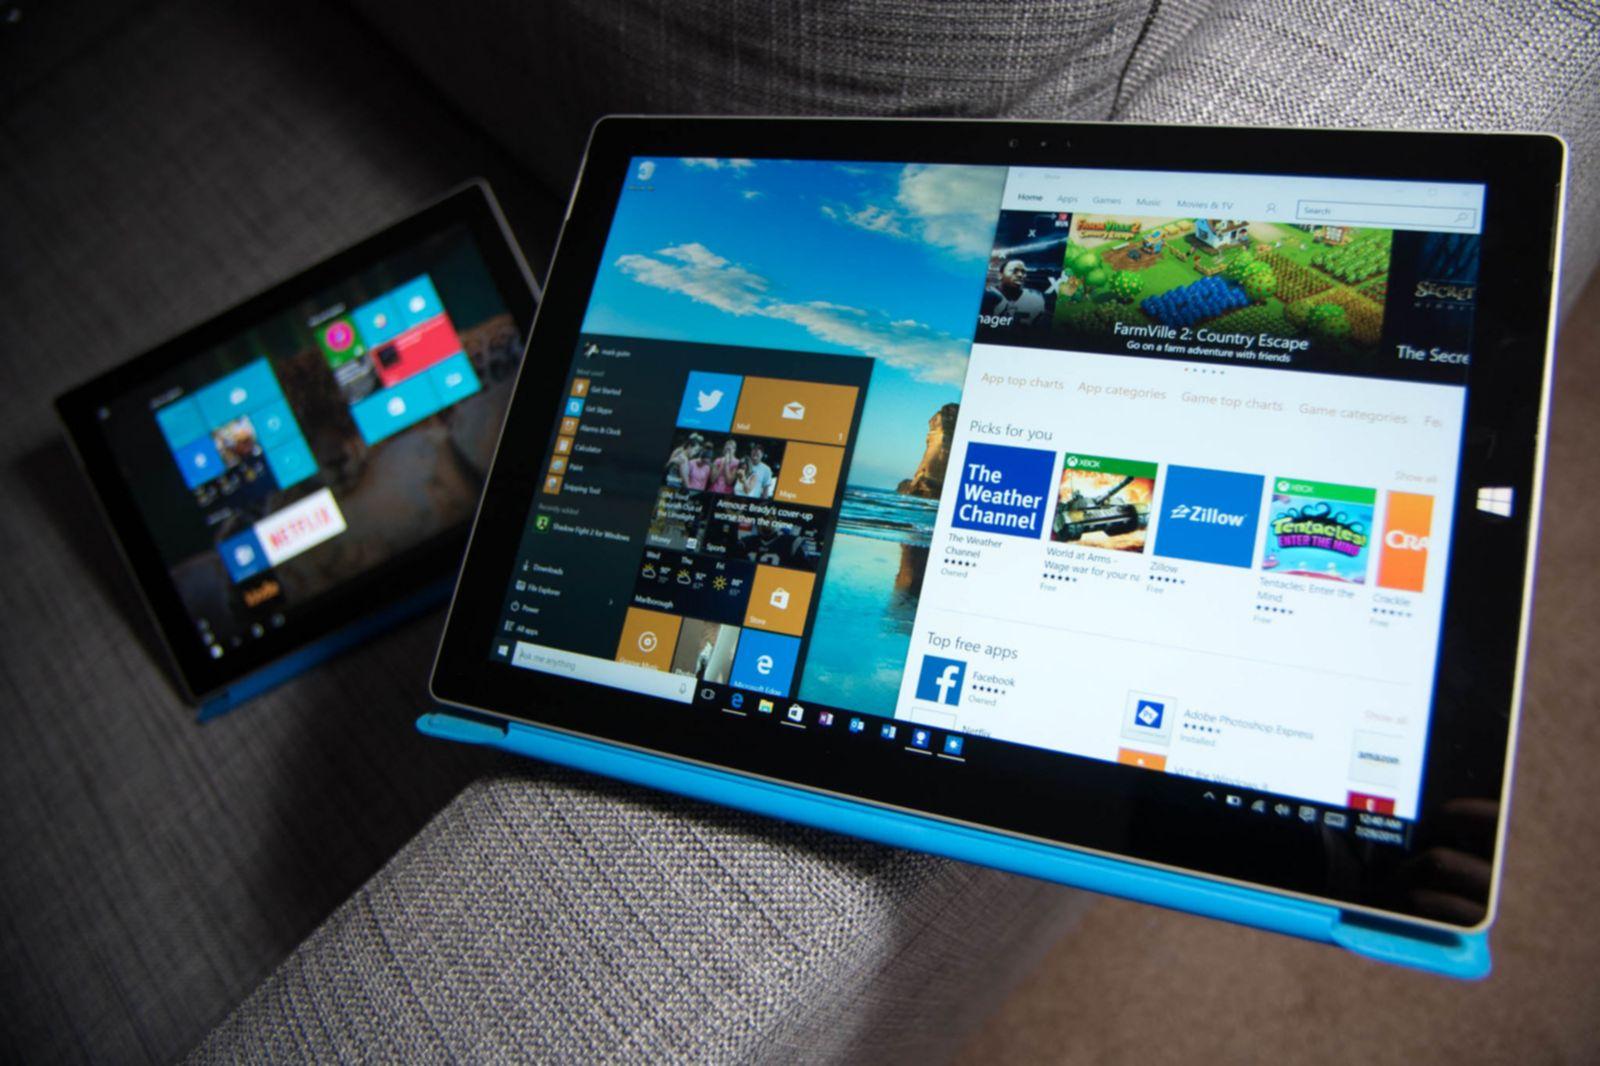 Windows 10 Update Bugs